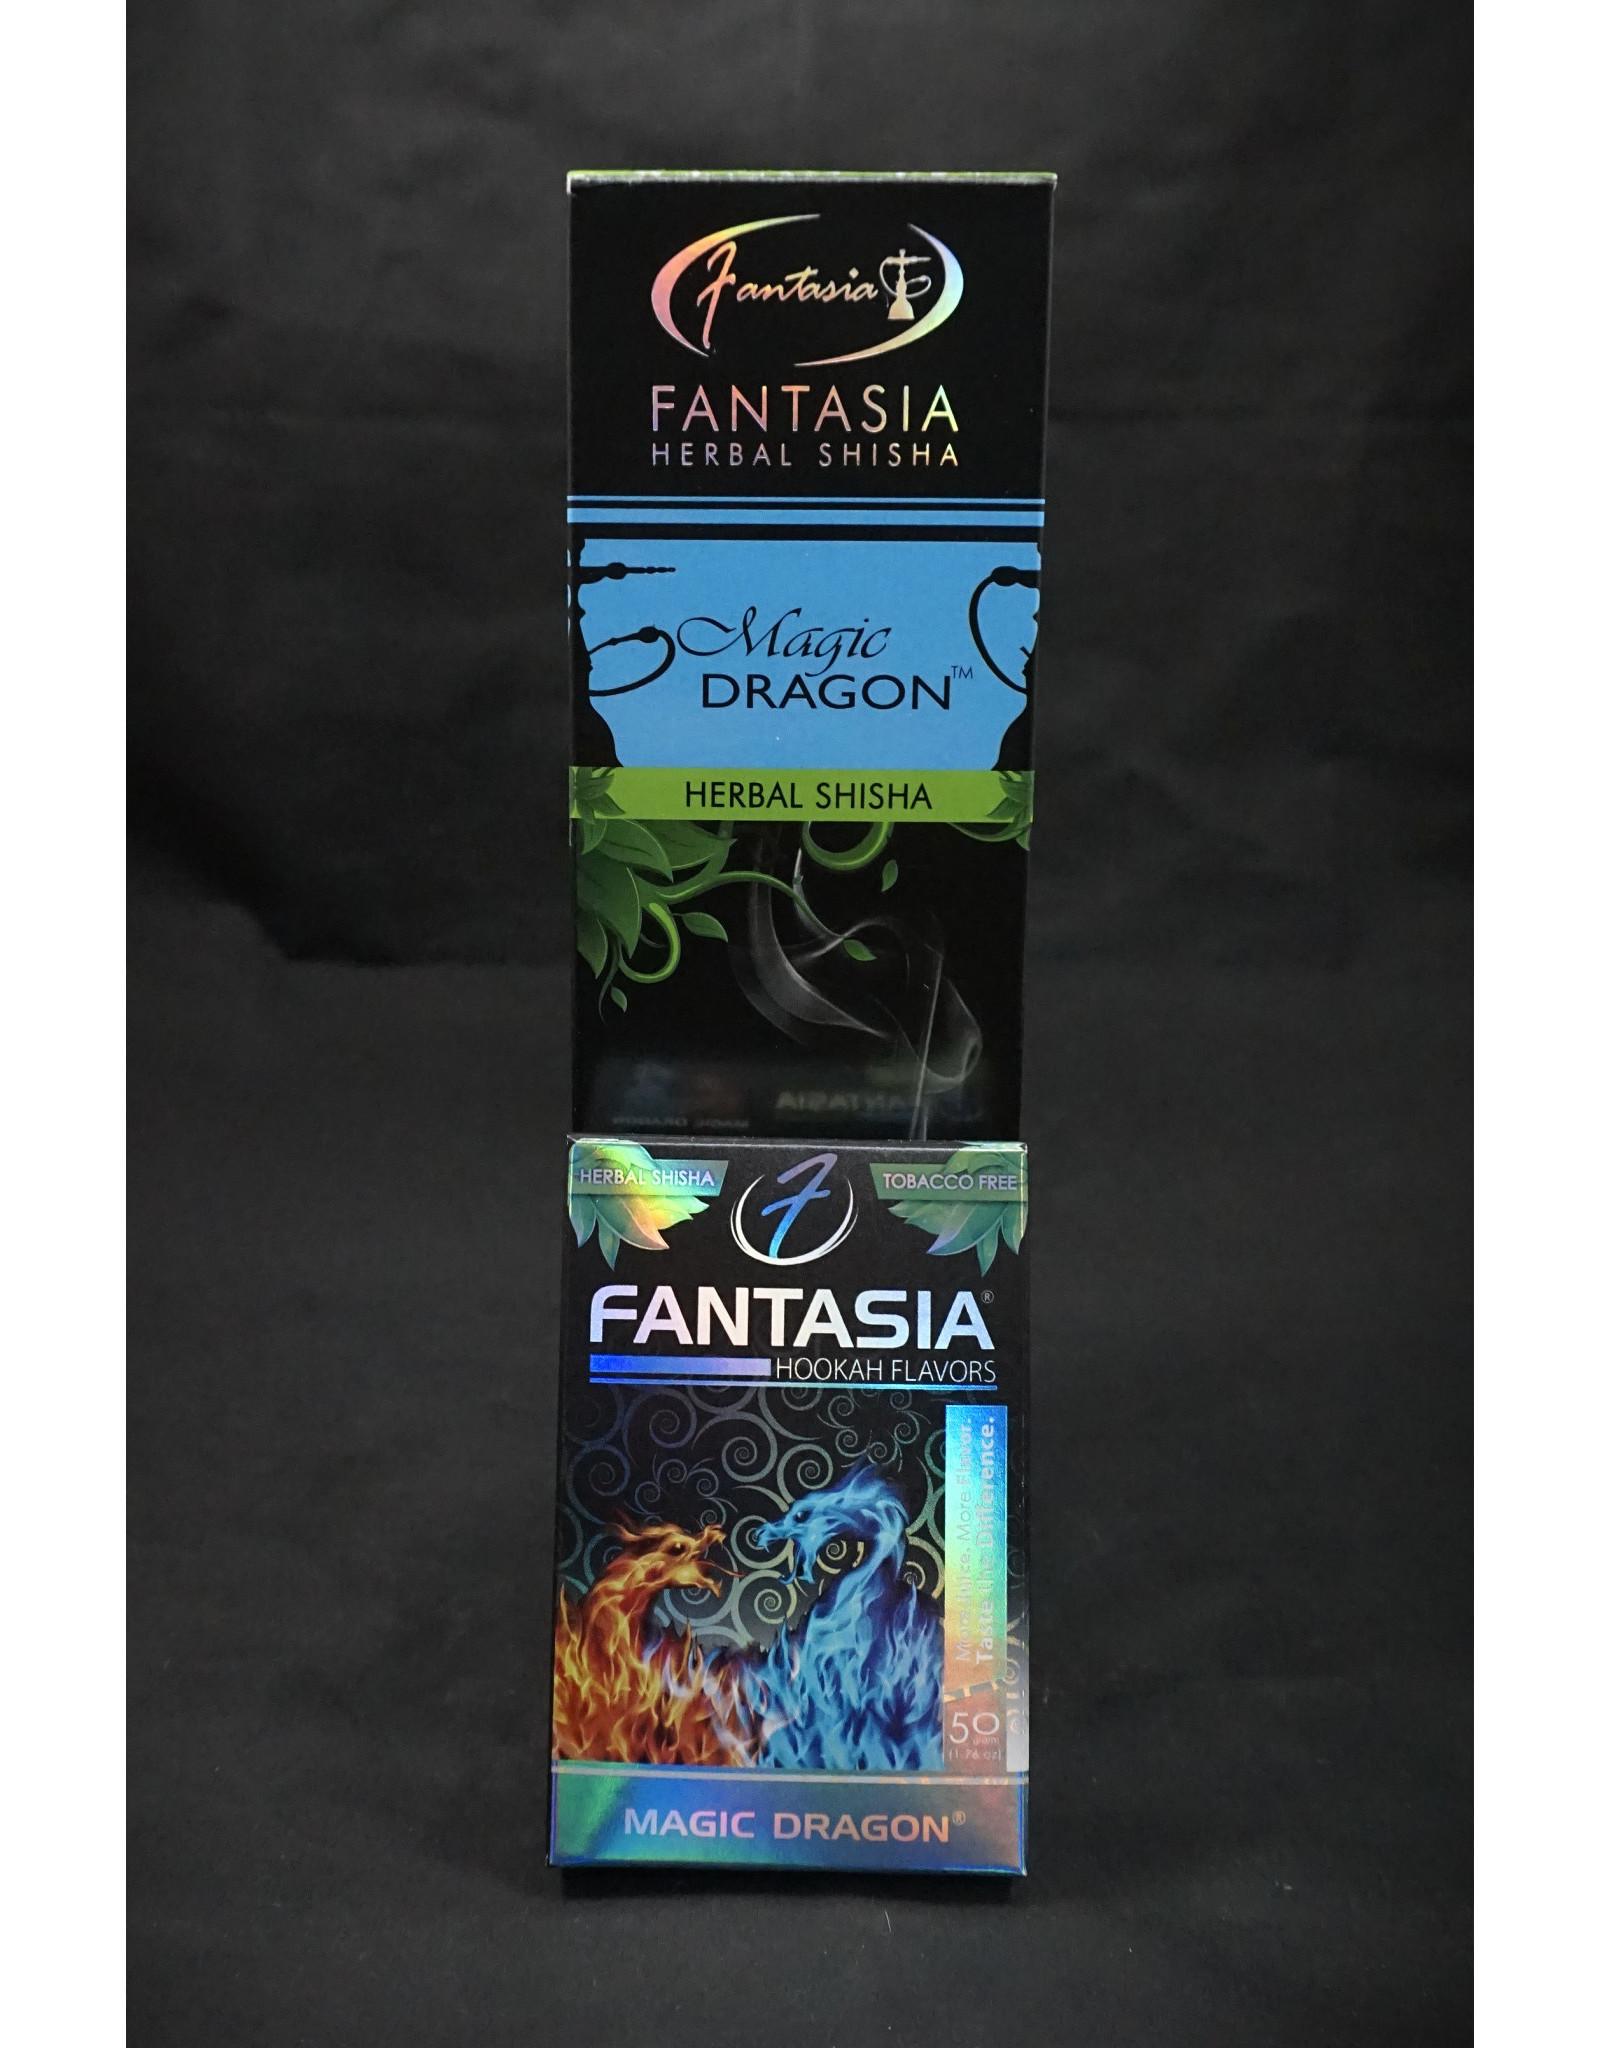 Fantasia Herbal Shisha - Magic Dragon